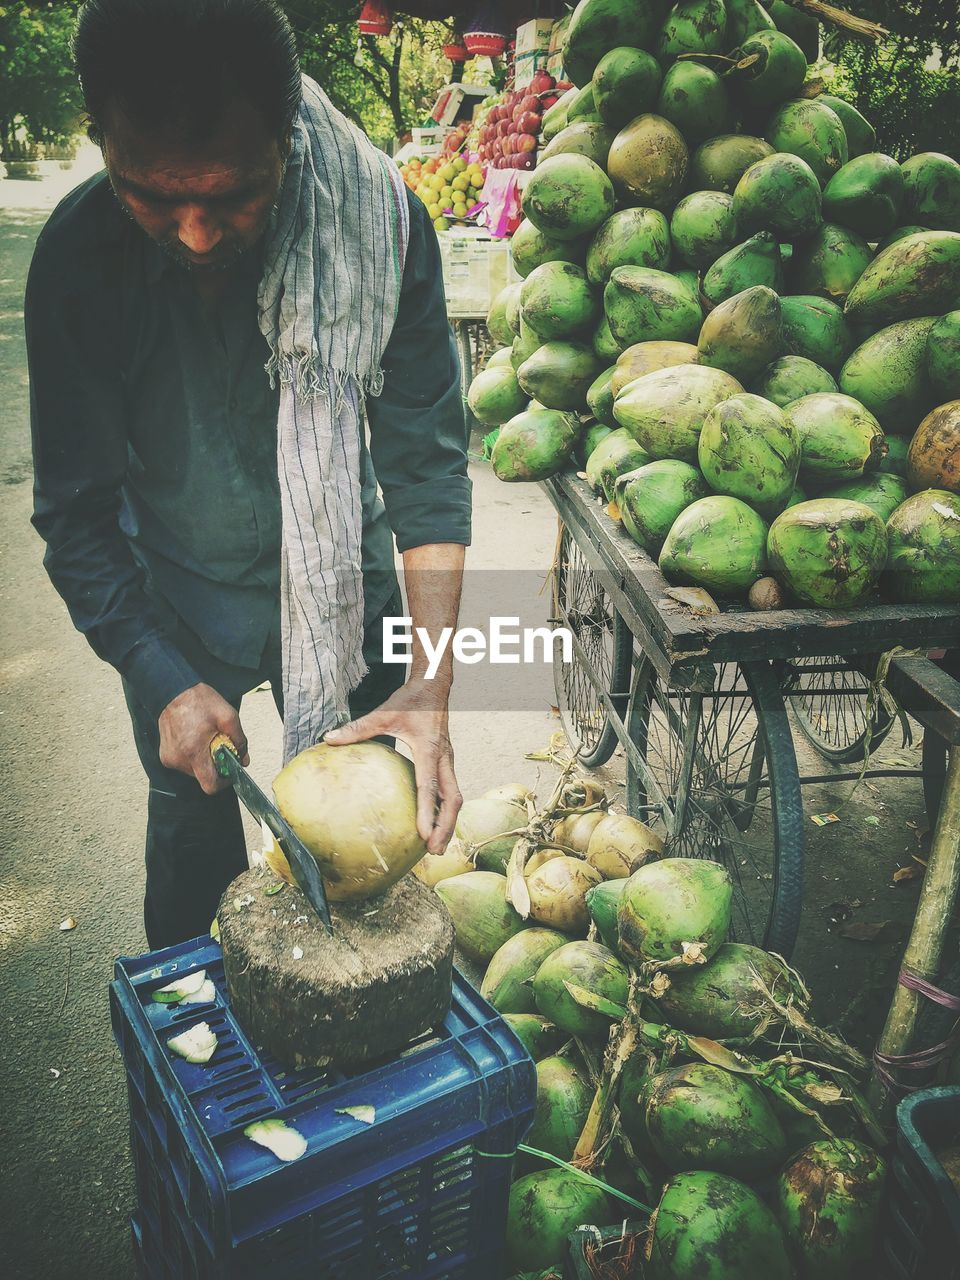 Vendor peeling coconuts at market stall